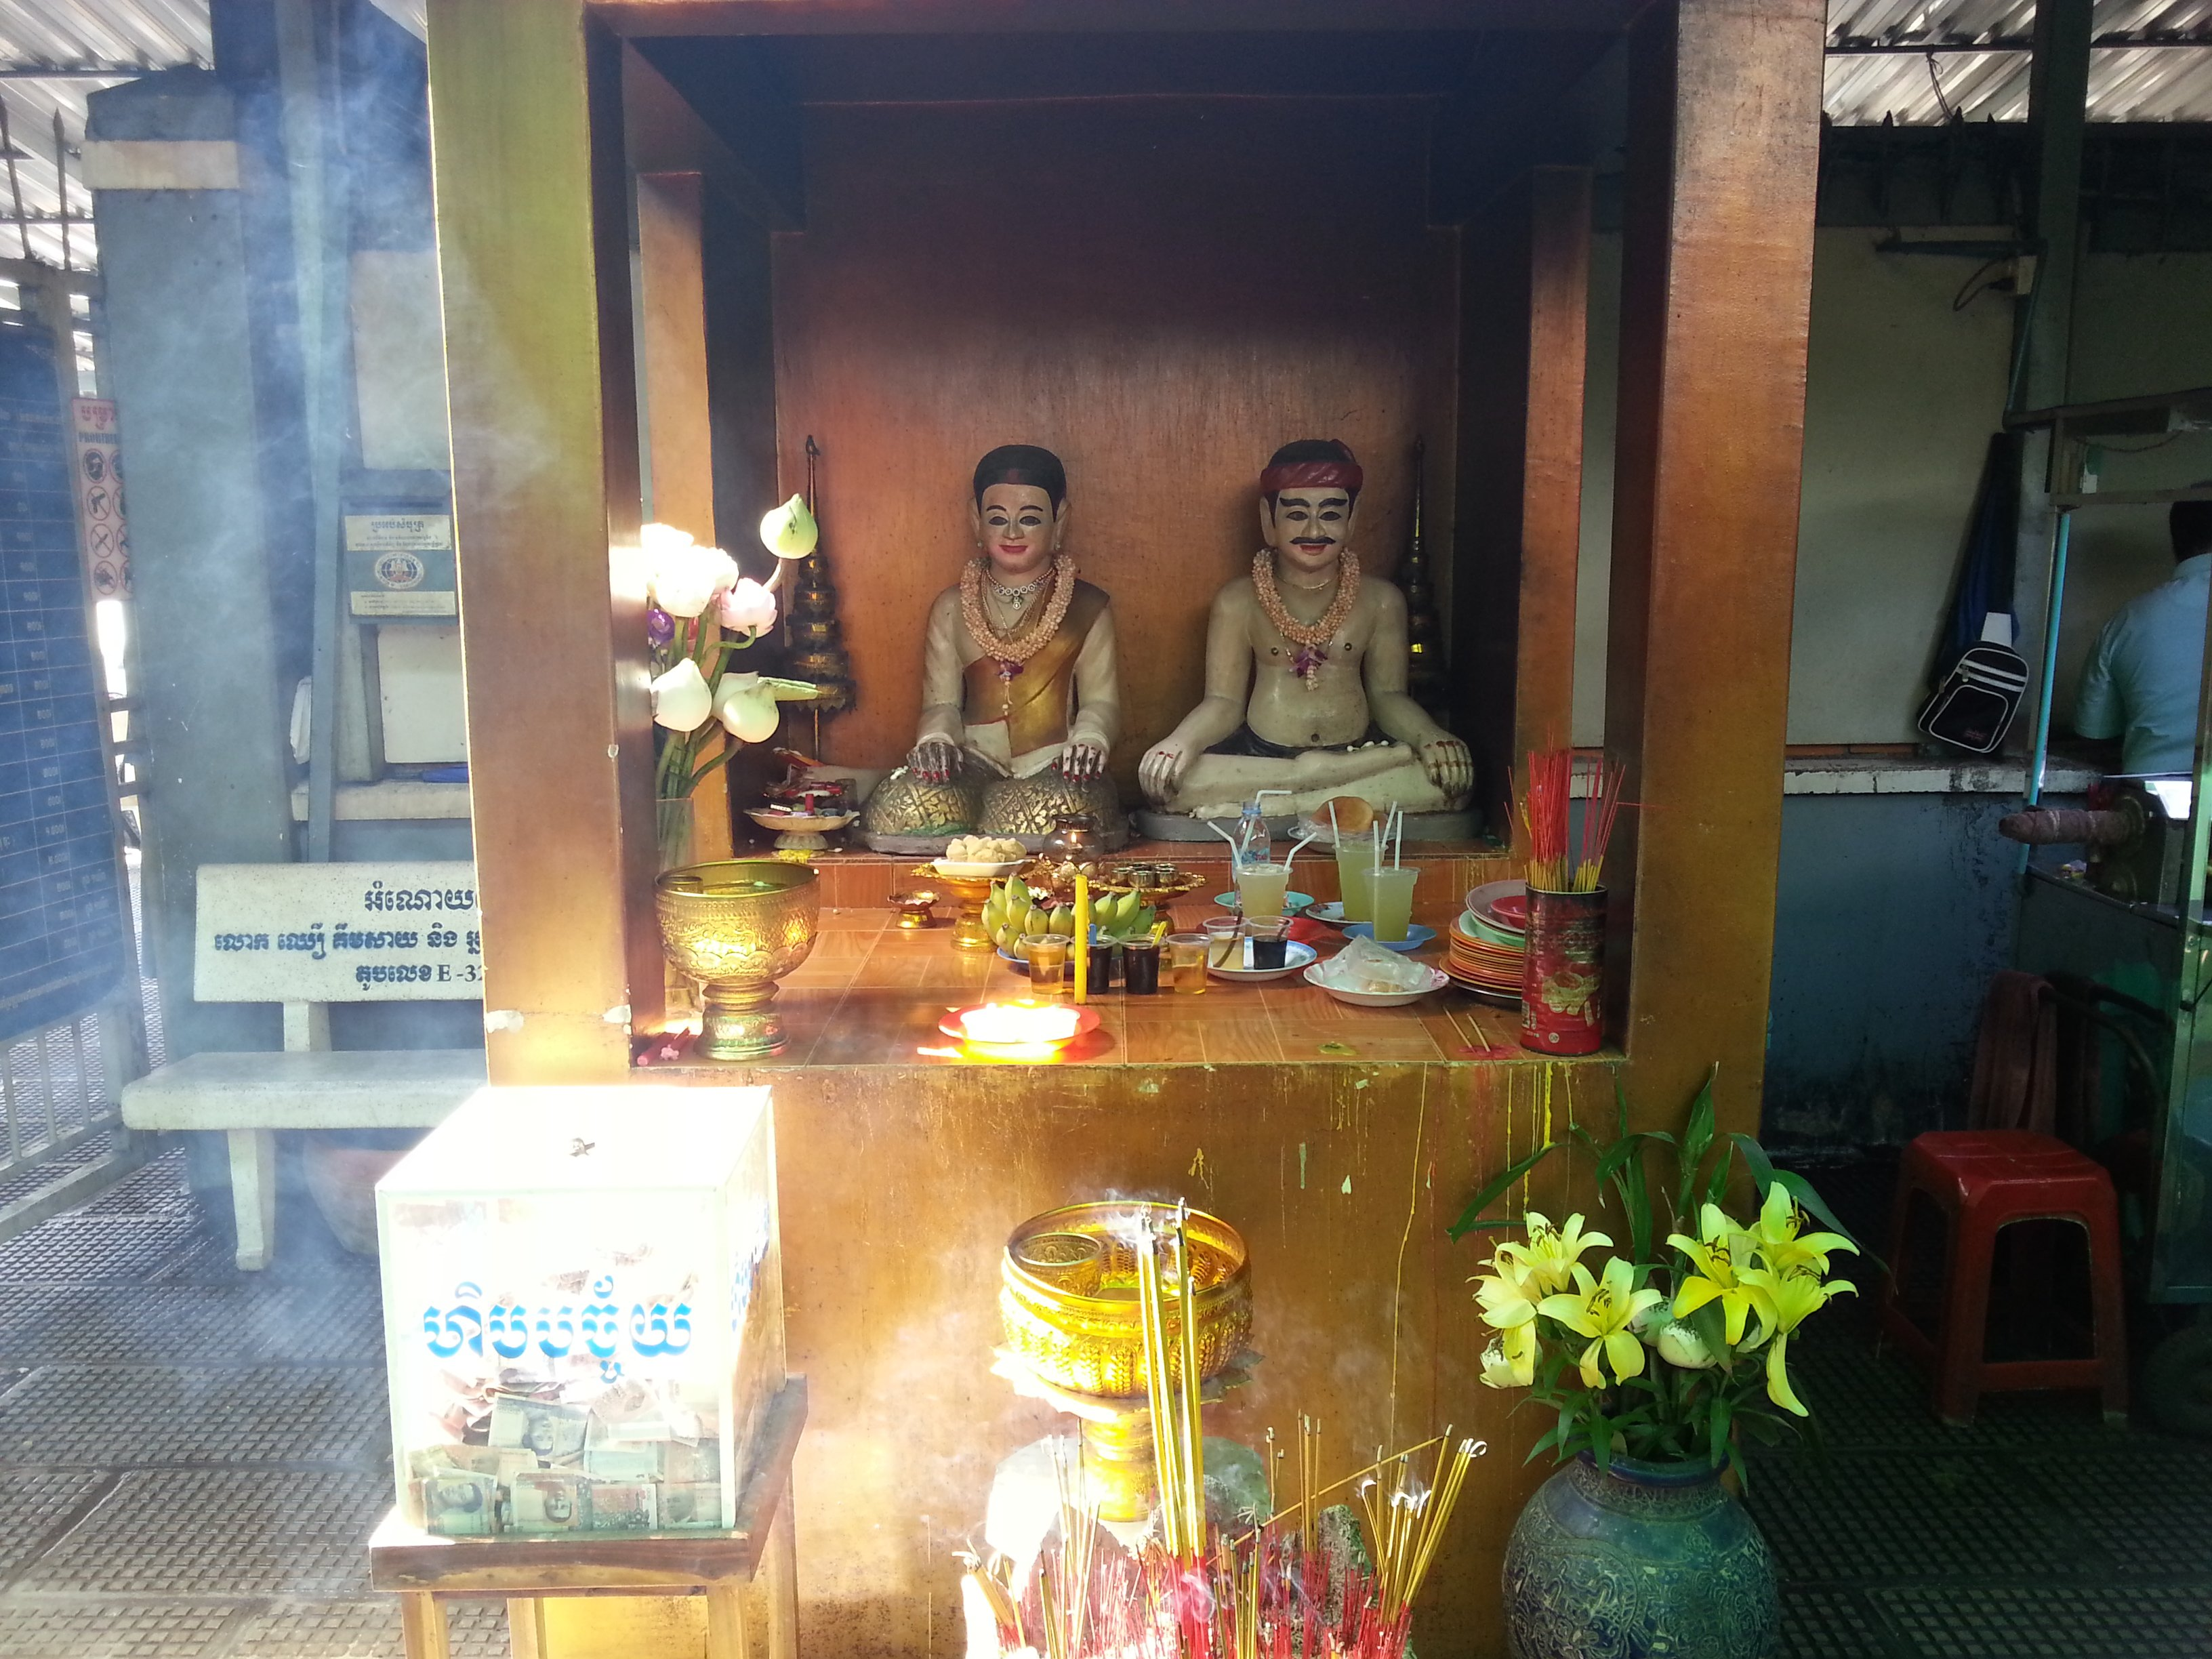 Phnom Penh Central Market has its own shrine